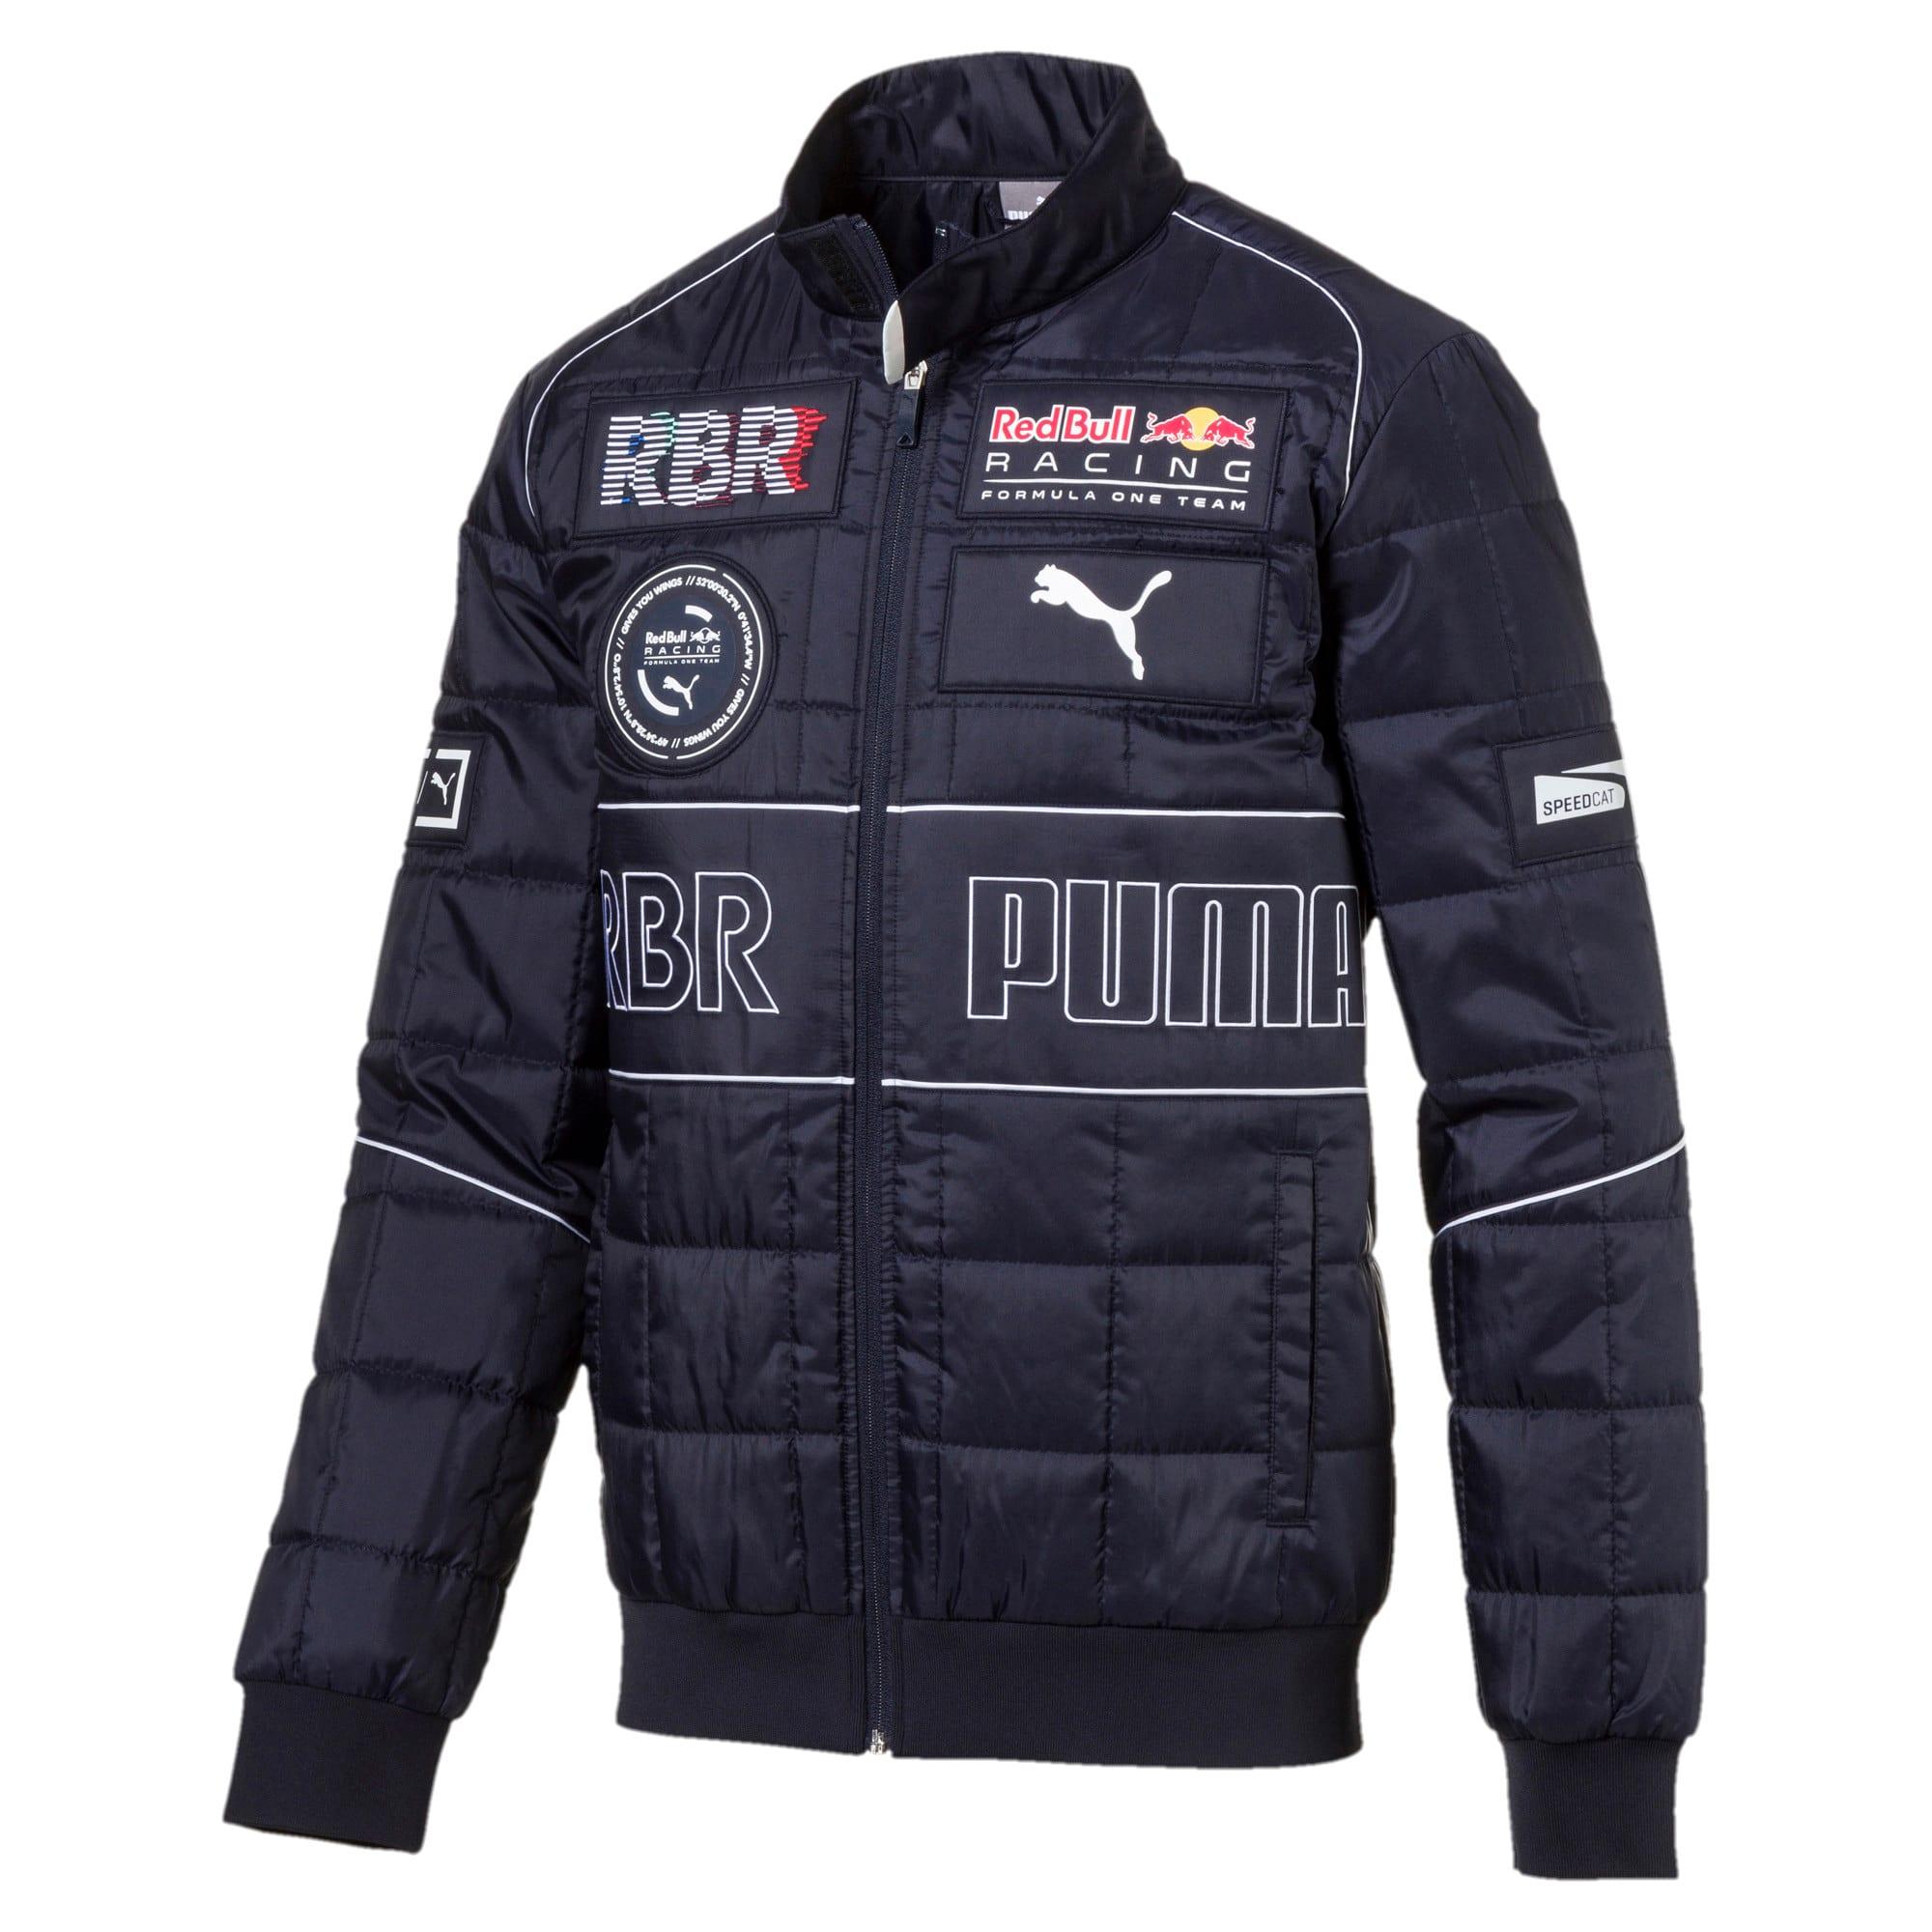 Thumbnail 1 of Red Bull Racing Speedcat Evo Zip-Up Men's Jacket, NIGHT SKY, medium-IND